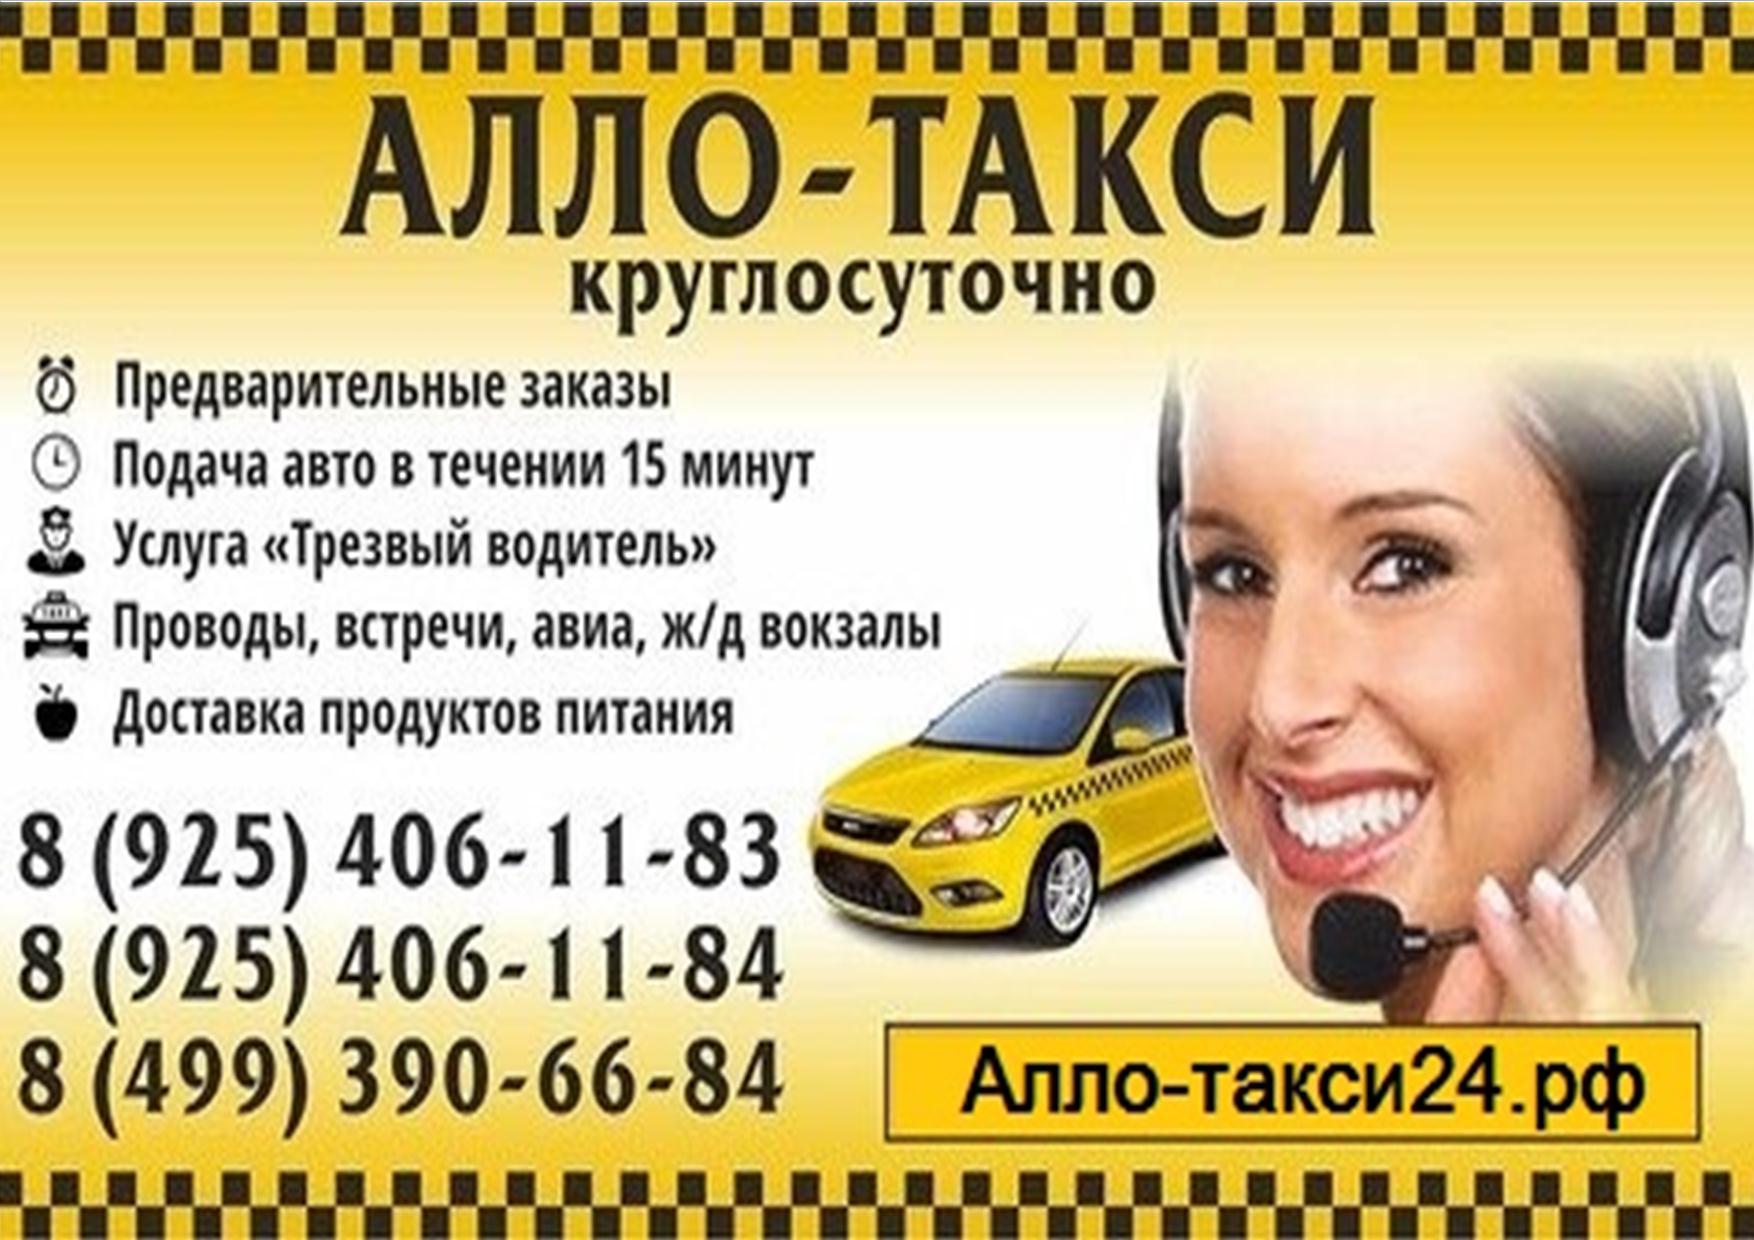 Такси vip